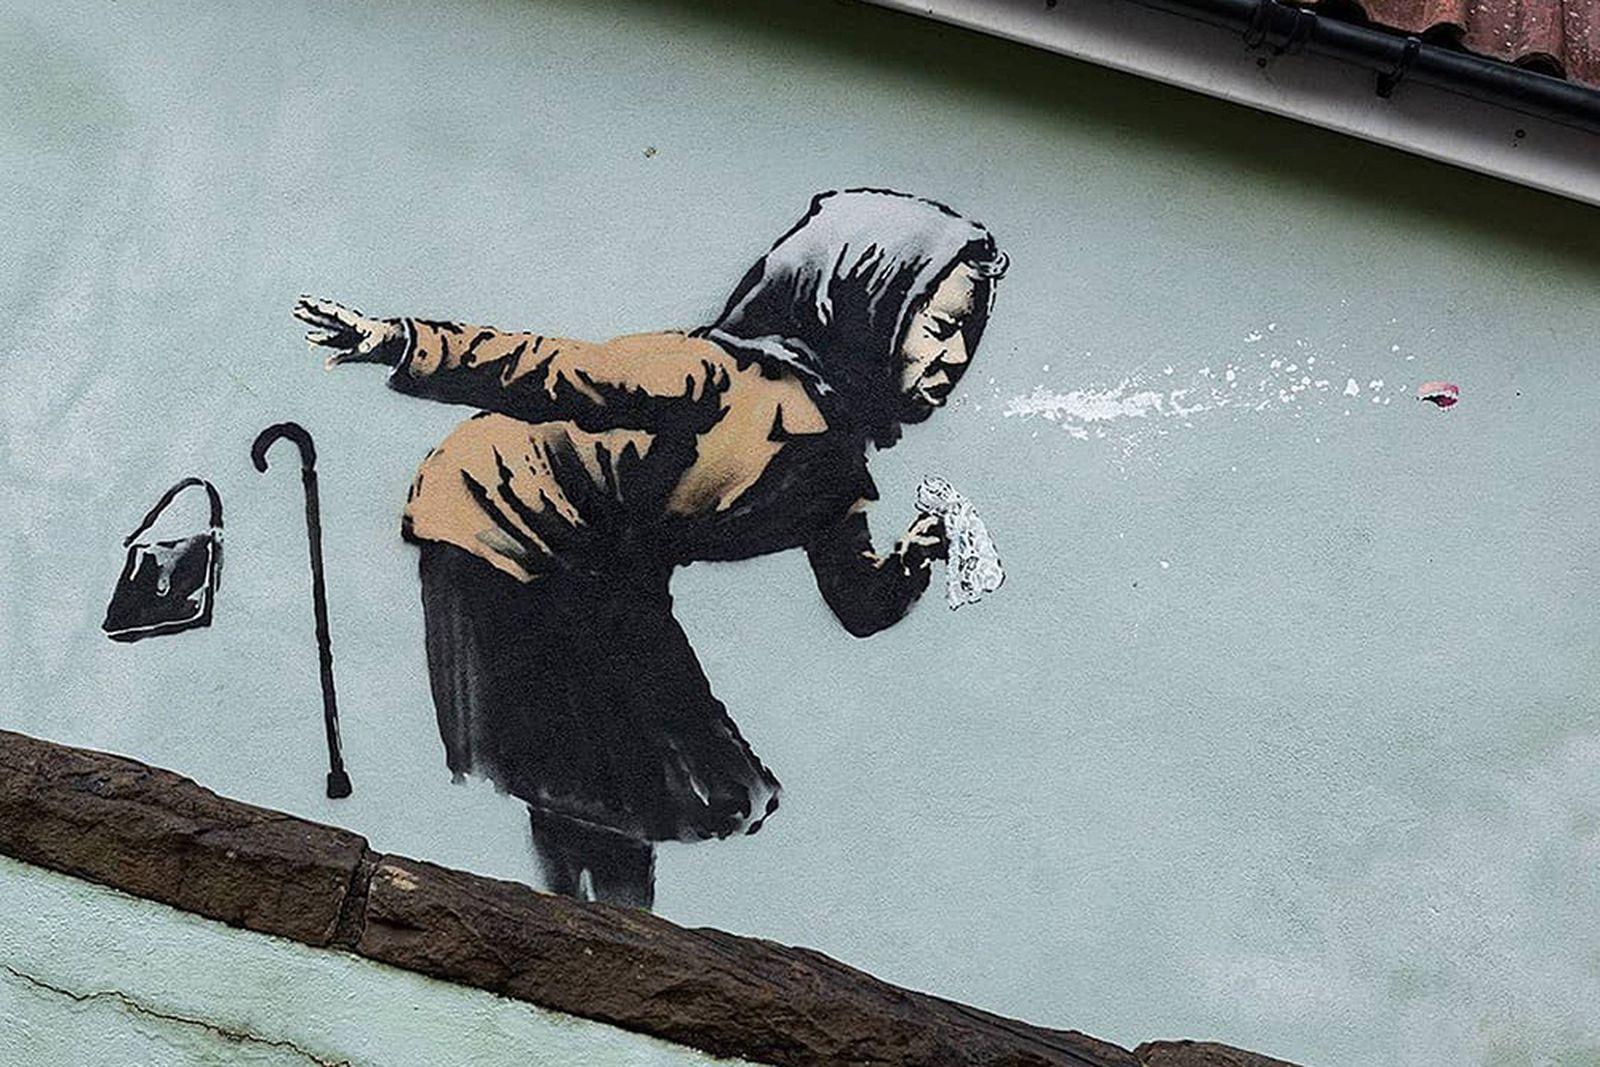 banksy-aachoo-artwork-bristol-02